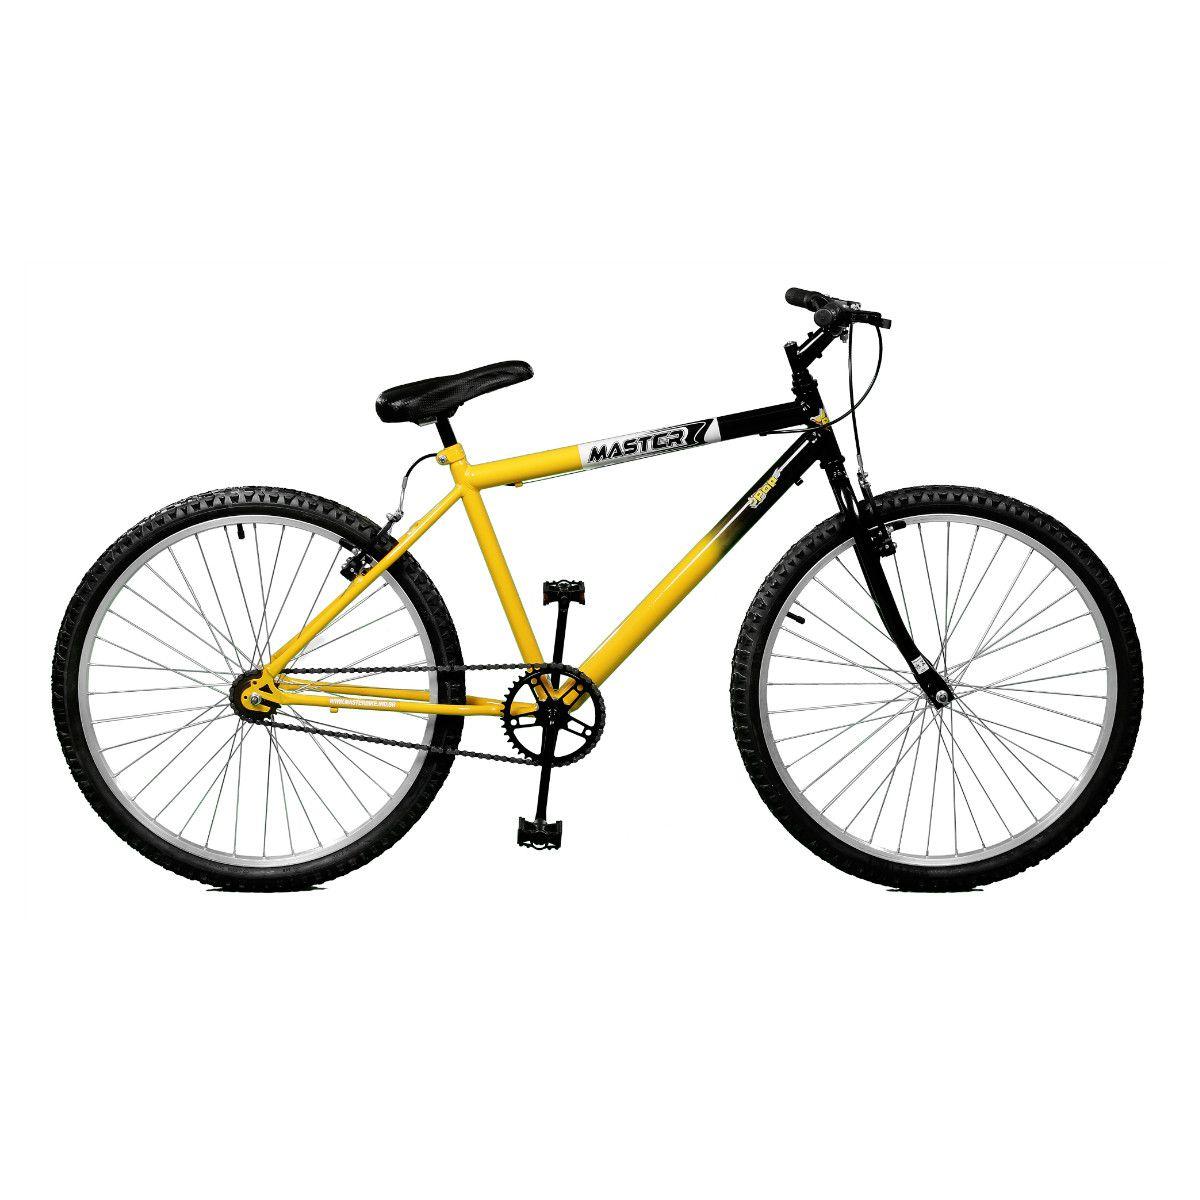 Bicicleta Master Bike Aro 26 Pop Freio V-Brake Amarelo/Preto